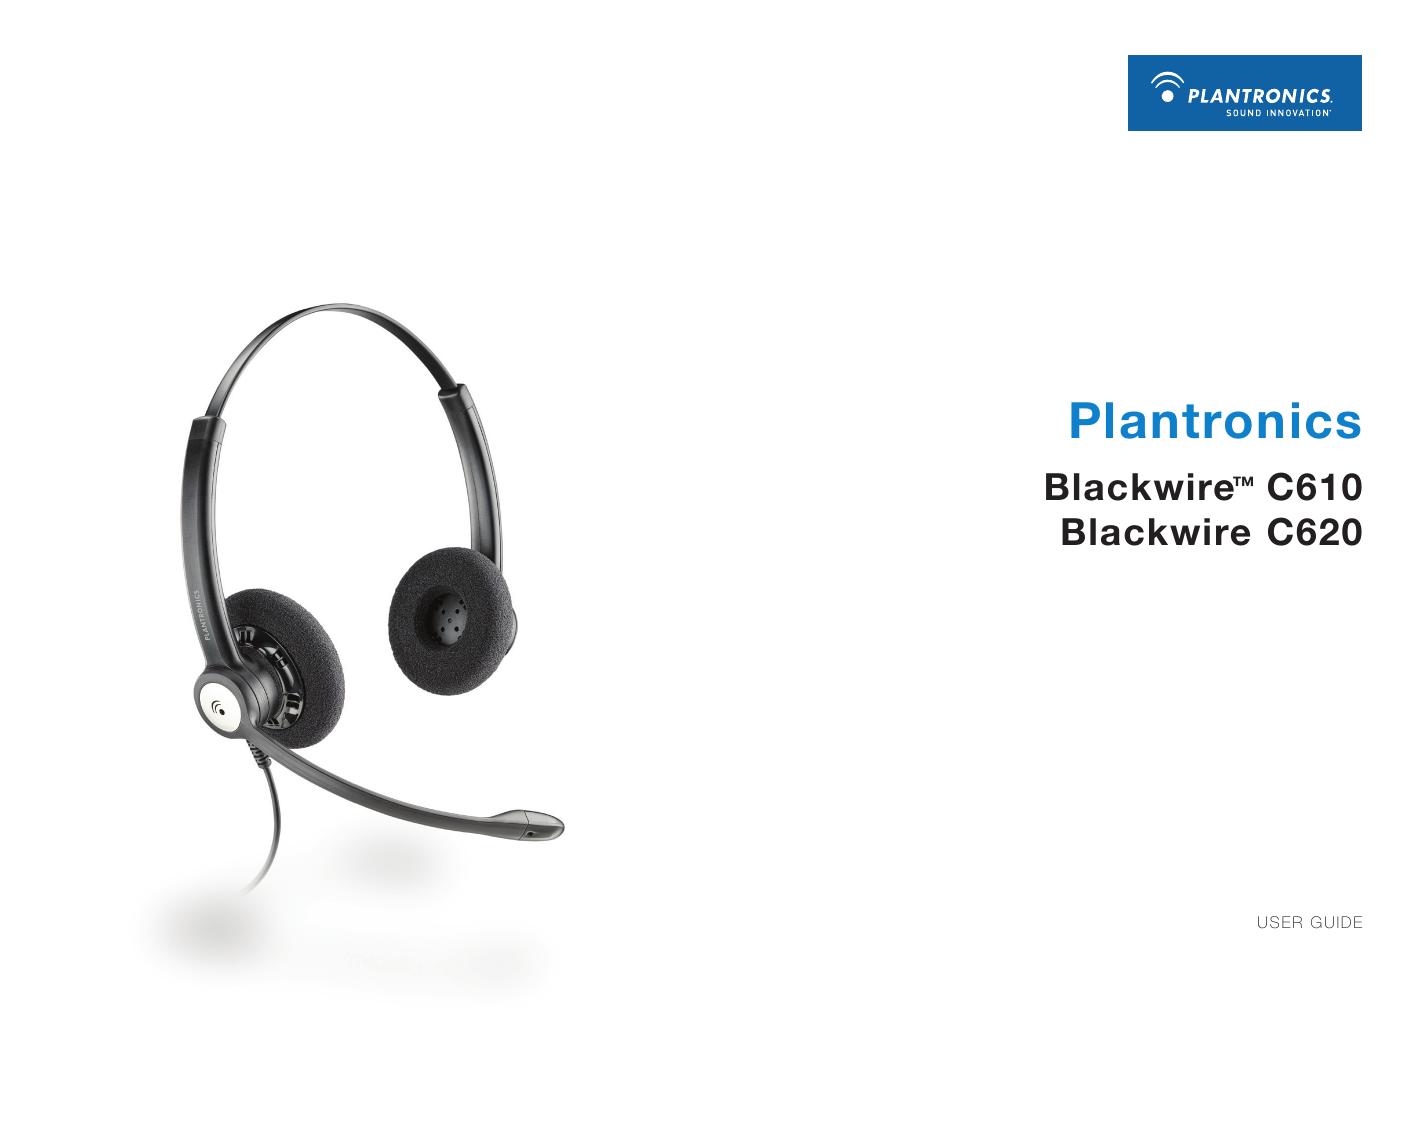 Plantronics Corded Headset Blackwire C610 User Manual Manualzz